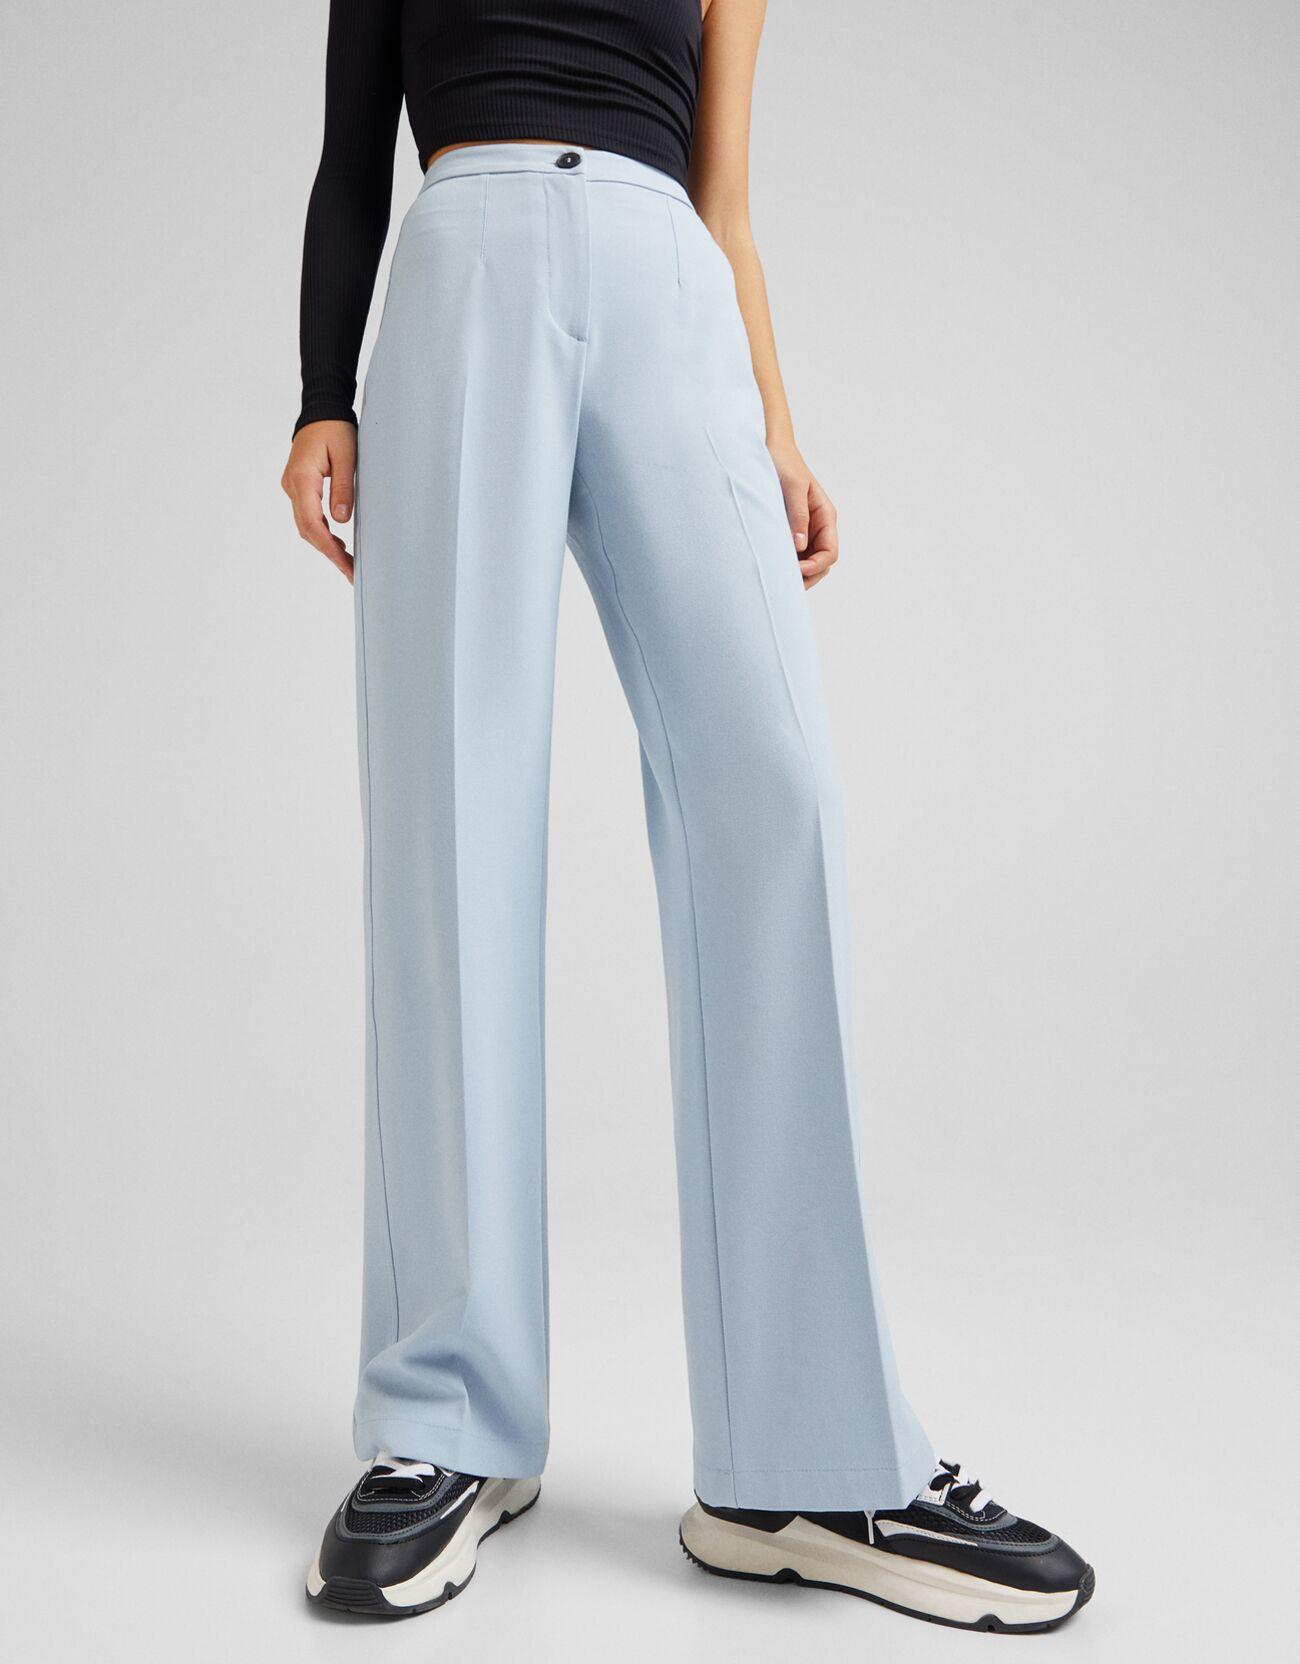 Голубой Широкие брюки с карманом сзади Bershka